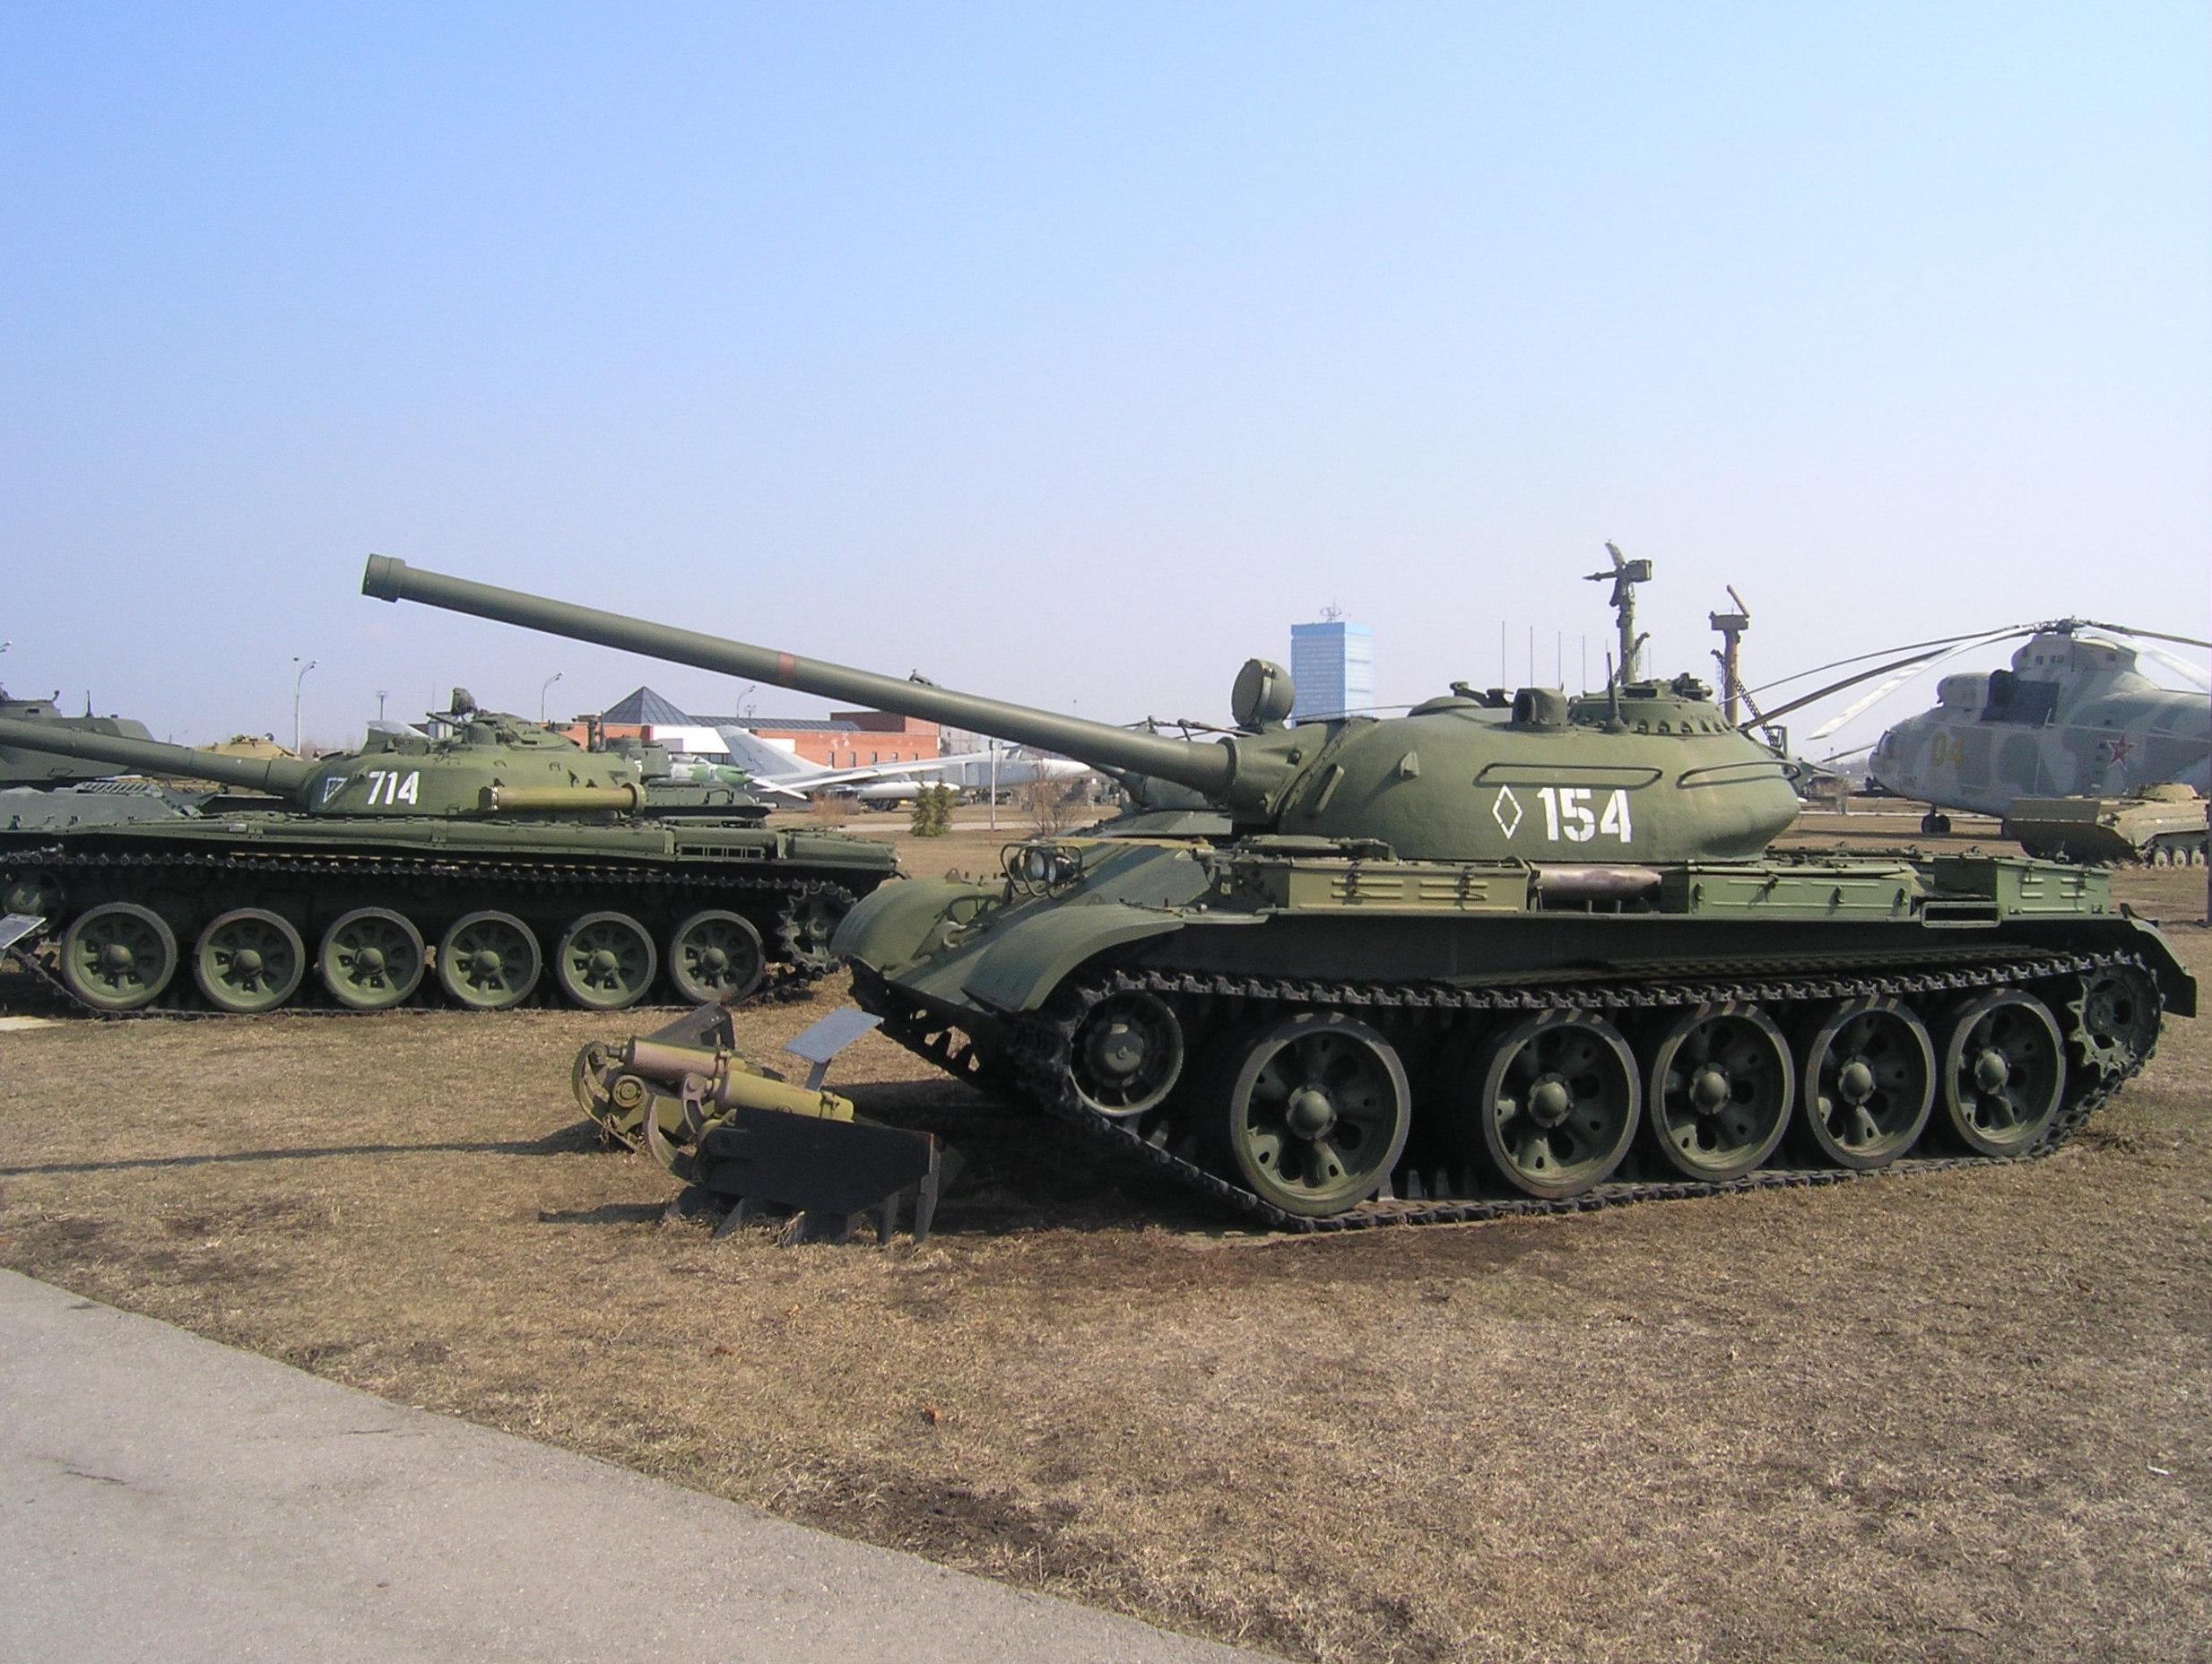 t-54-2-4540.JPG